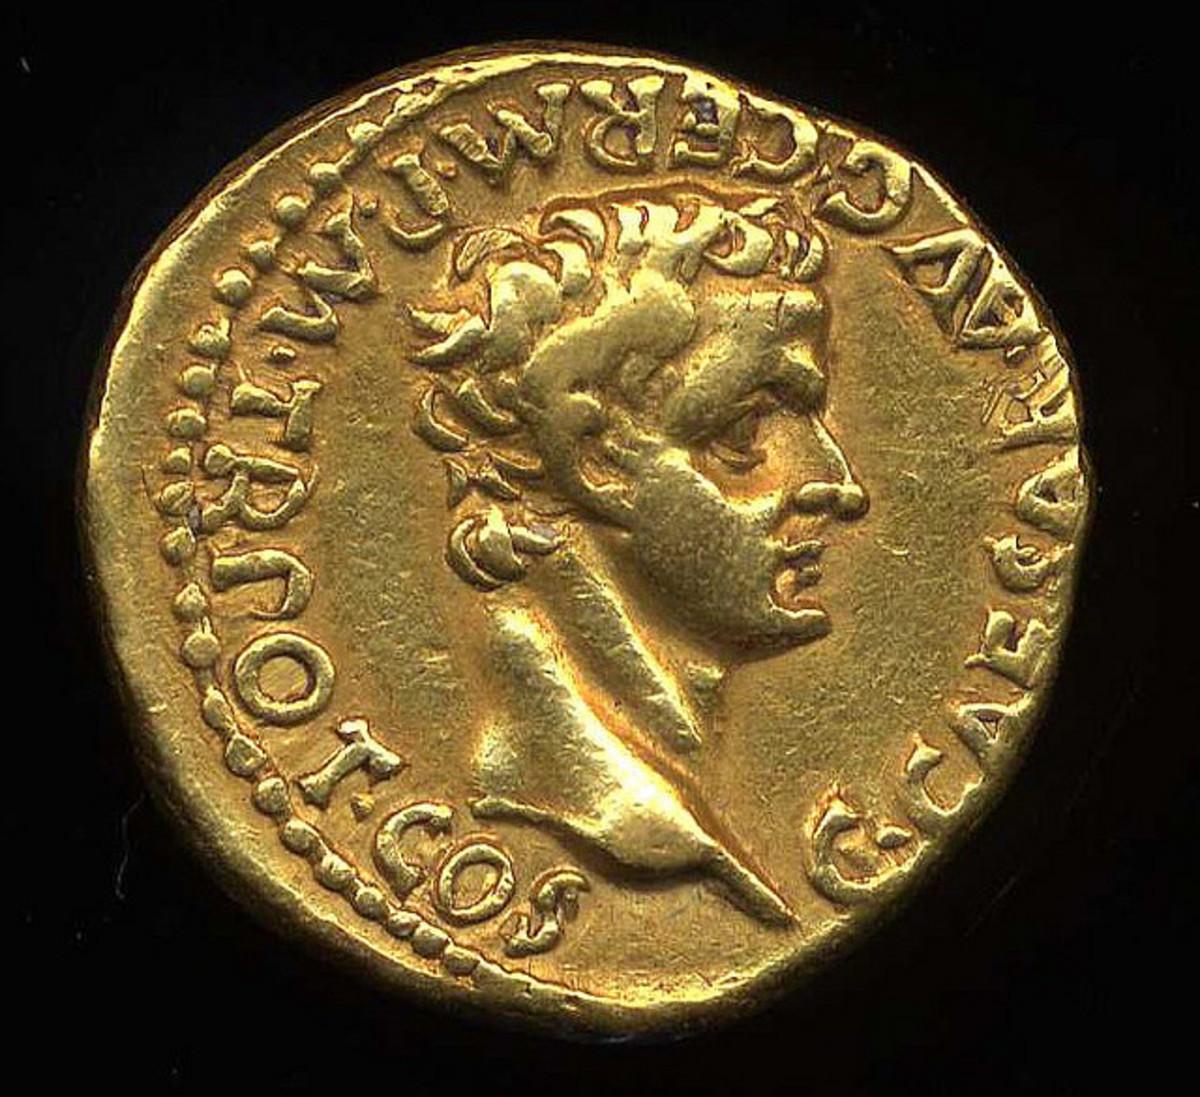 10 Weird Things You Didn't Know Caligula Did